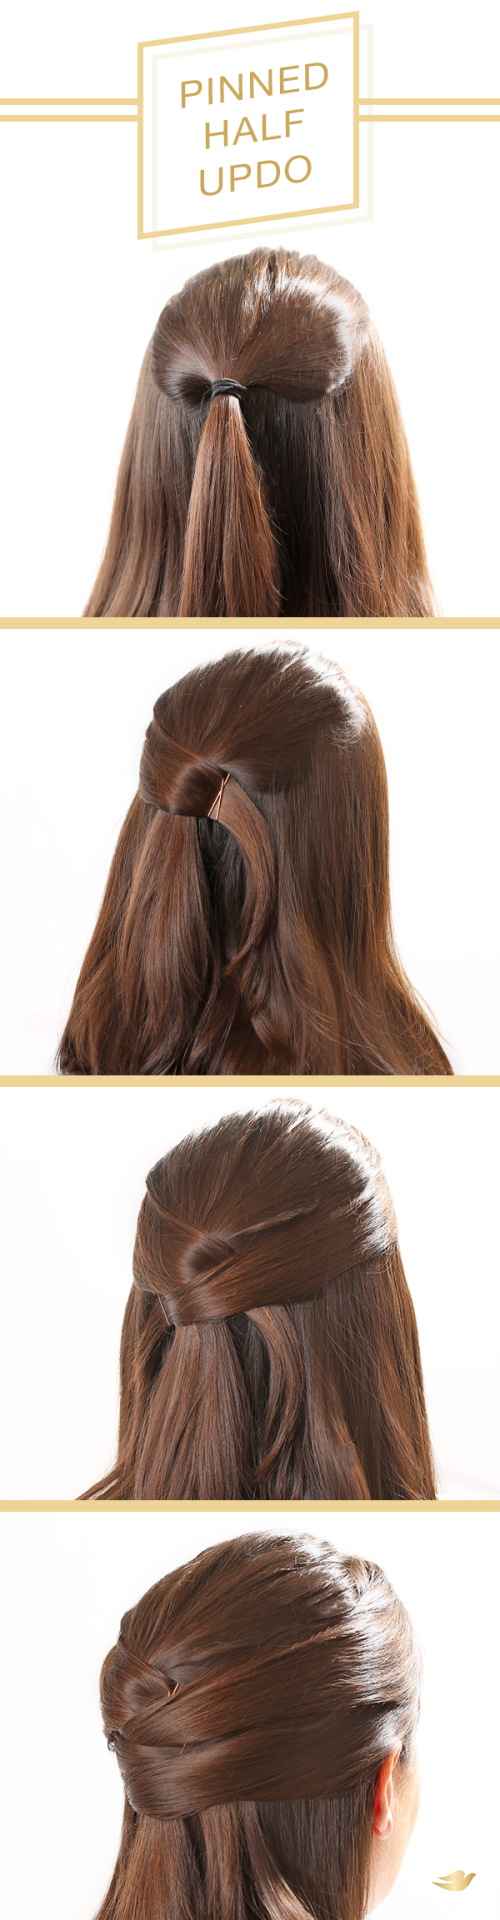 To Get This Beautiful Pinned Half Updo Follow This Step By Step Hair Tutorial It S A Pretty Style T Frisuren Frisur Hochgesteckt Schulterlange Haare Frisuren